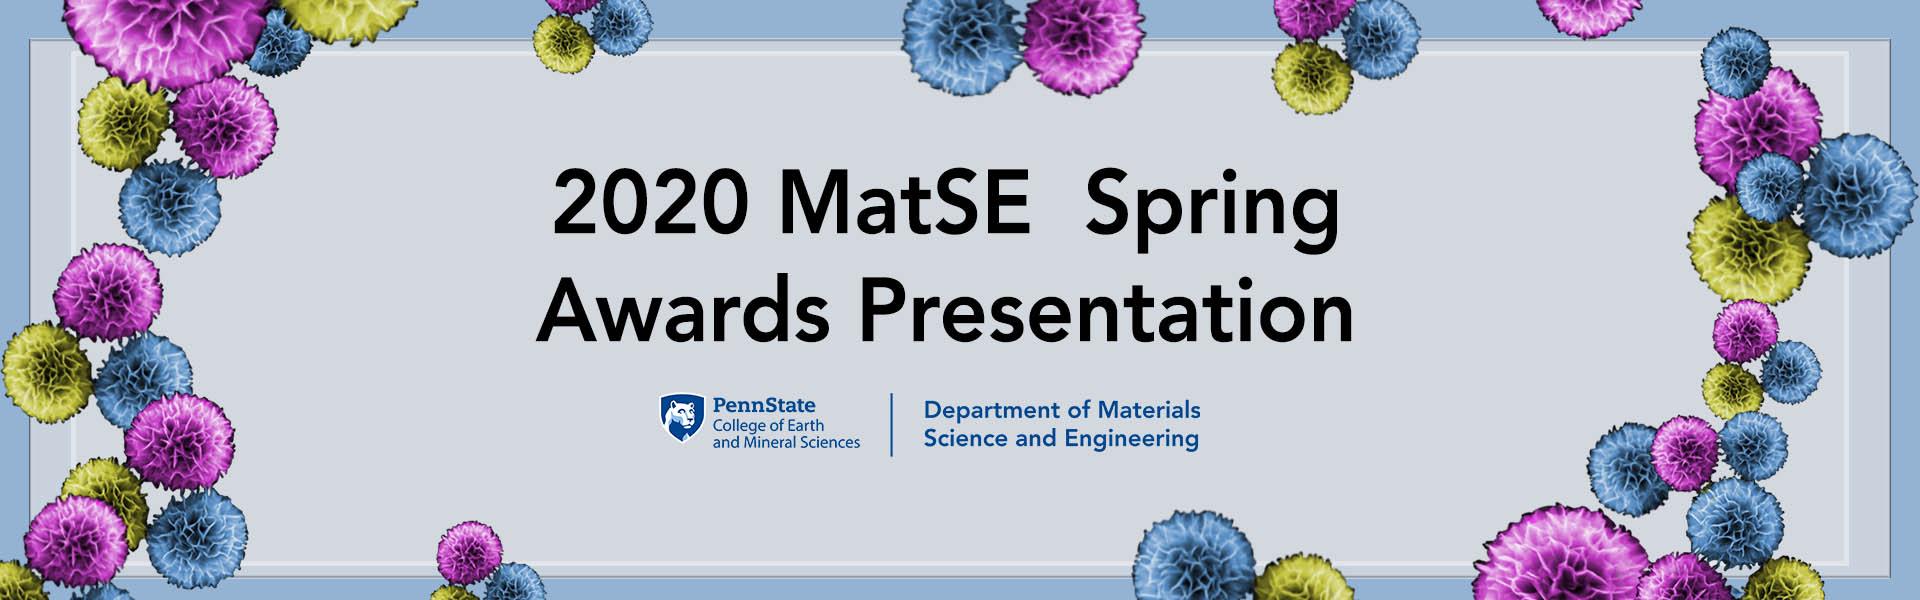 2020 MatSE Awards Presentation